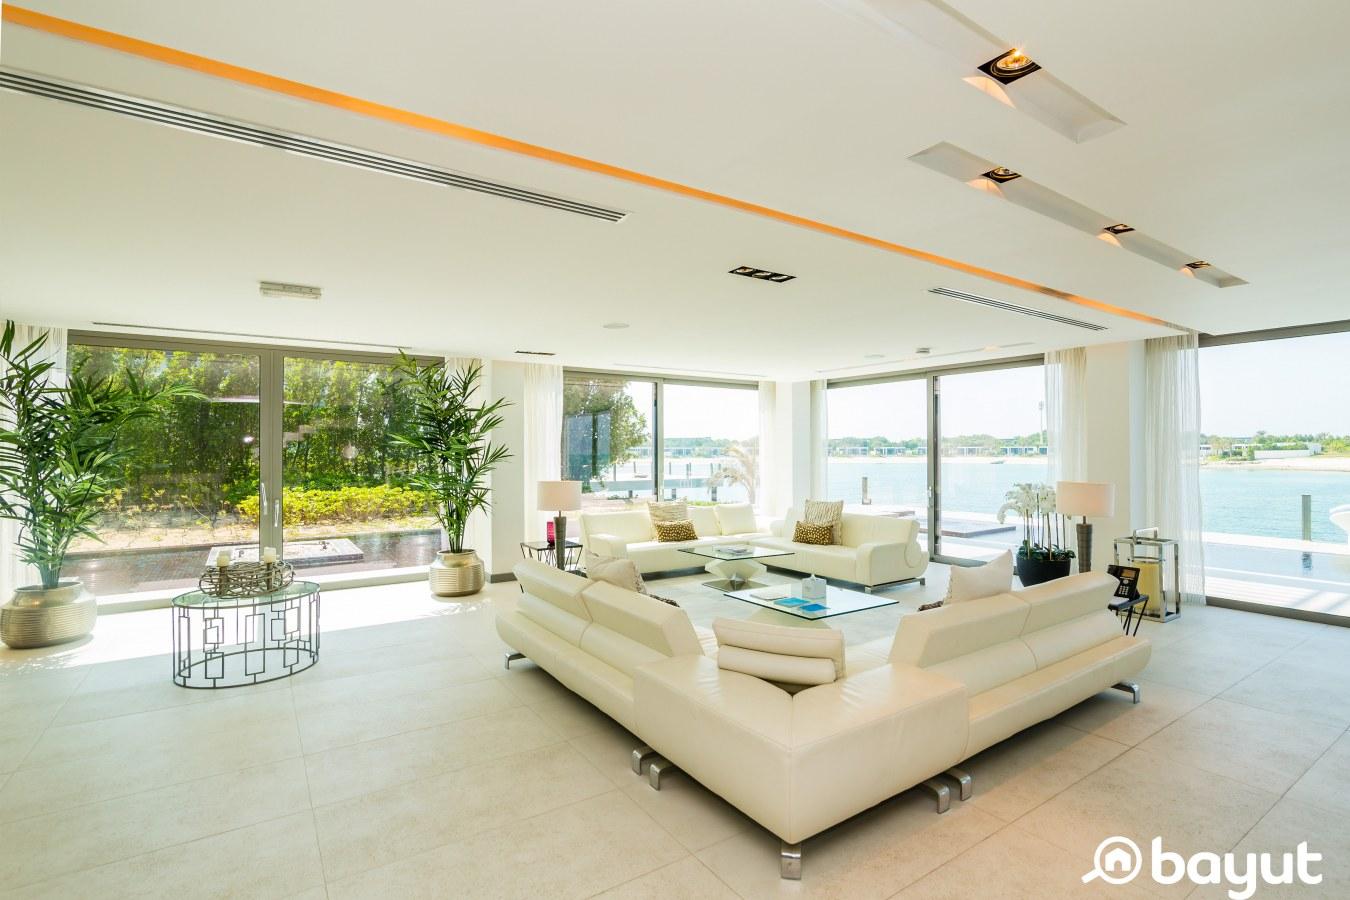 the living room white views of the Arabian Gulf and white furniture in a villa in Nurai Island Abu Dhabi